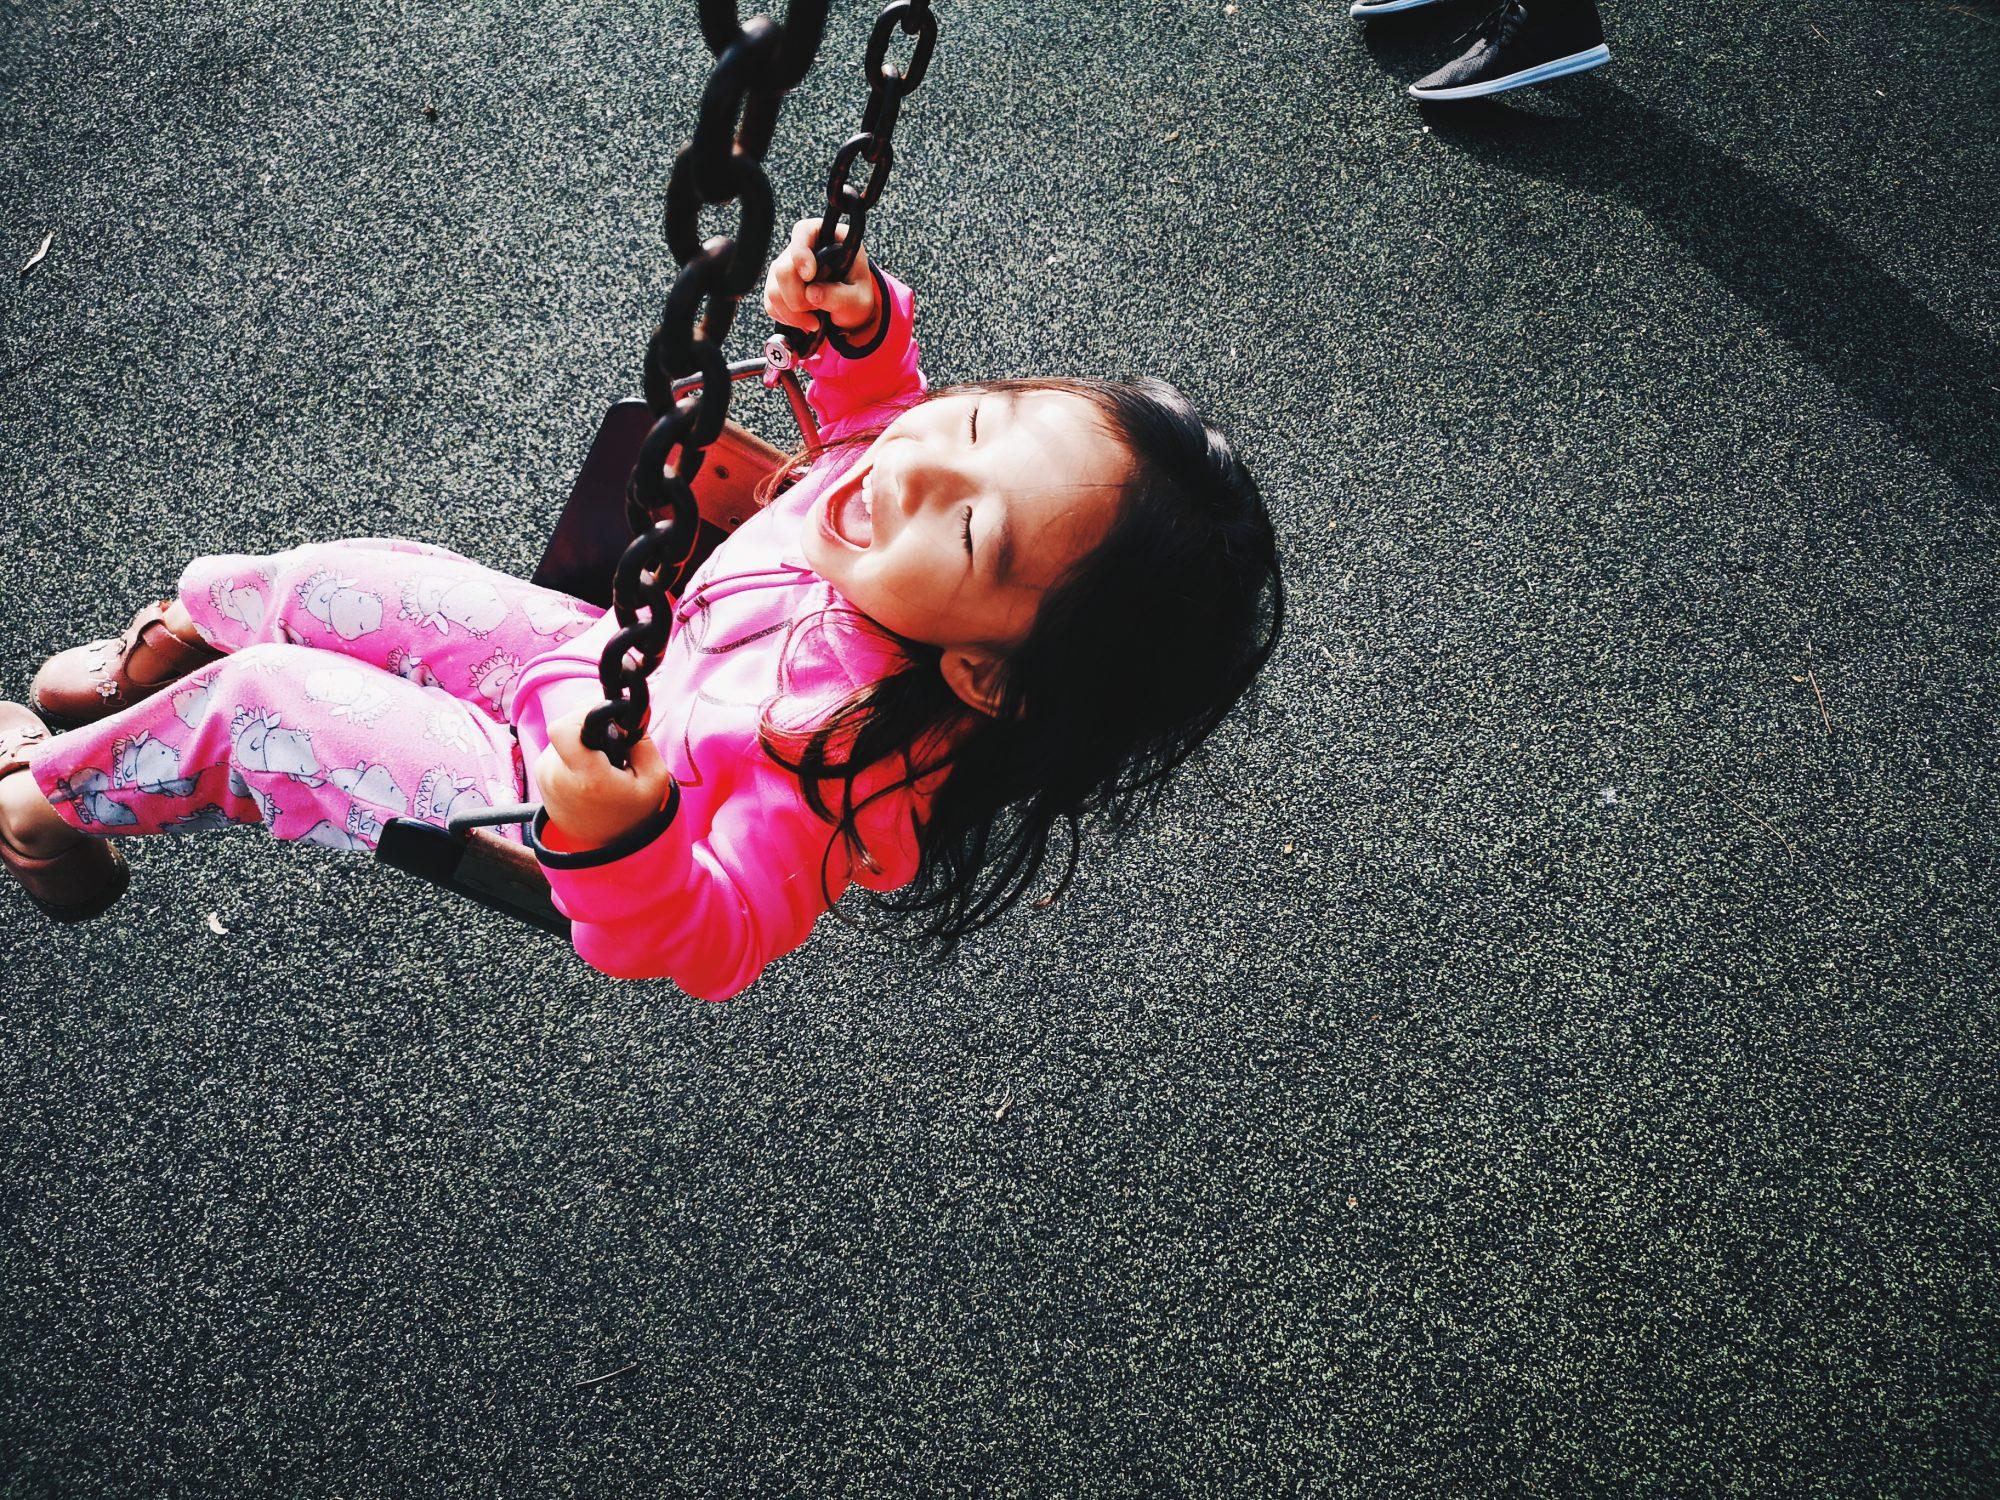 Amelia swings